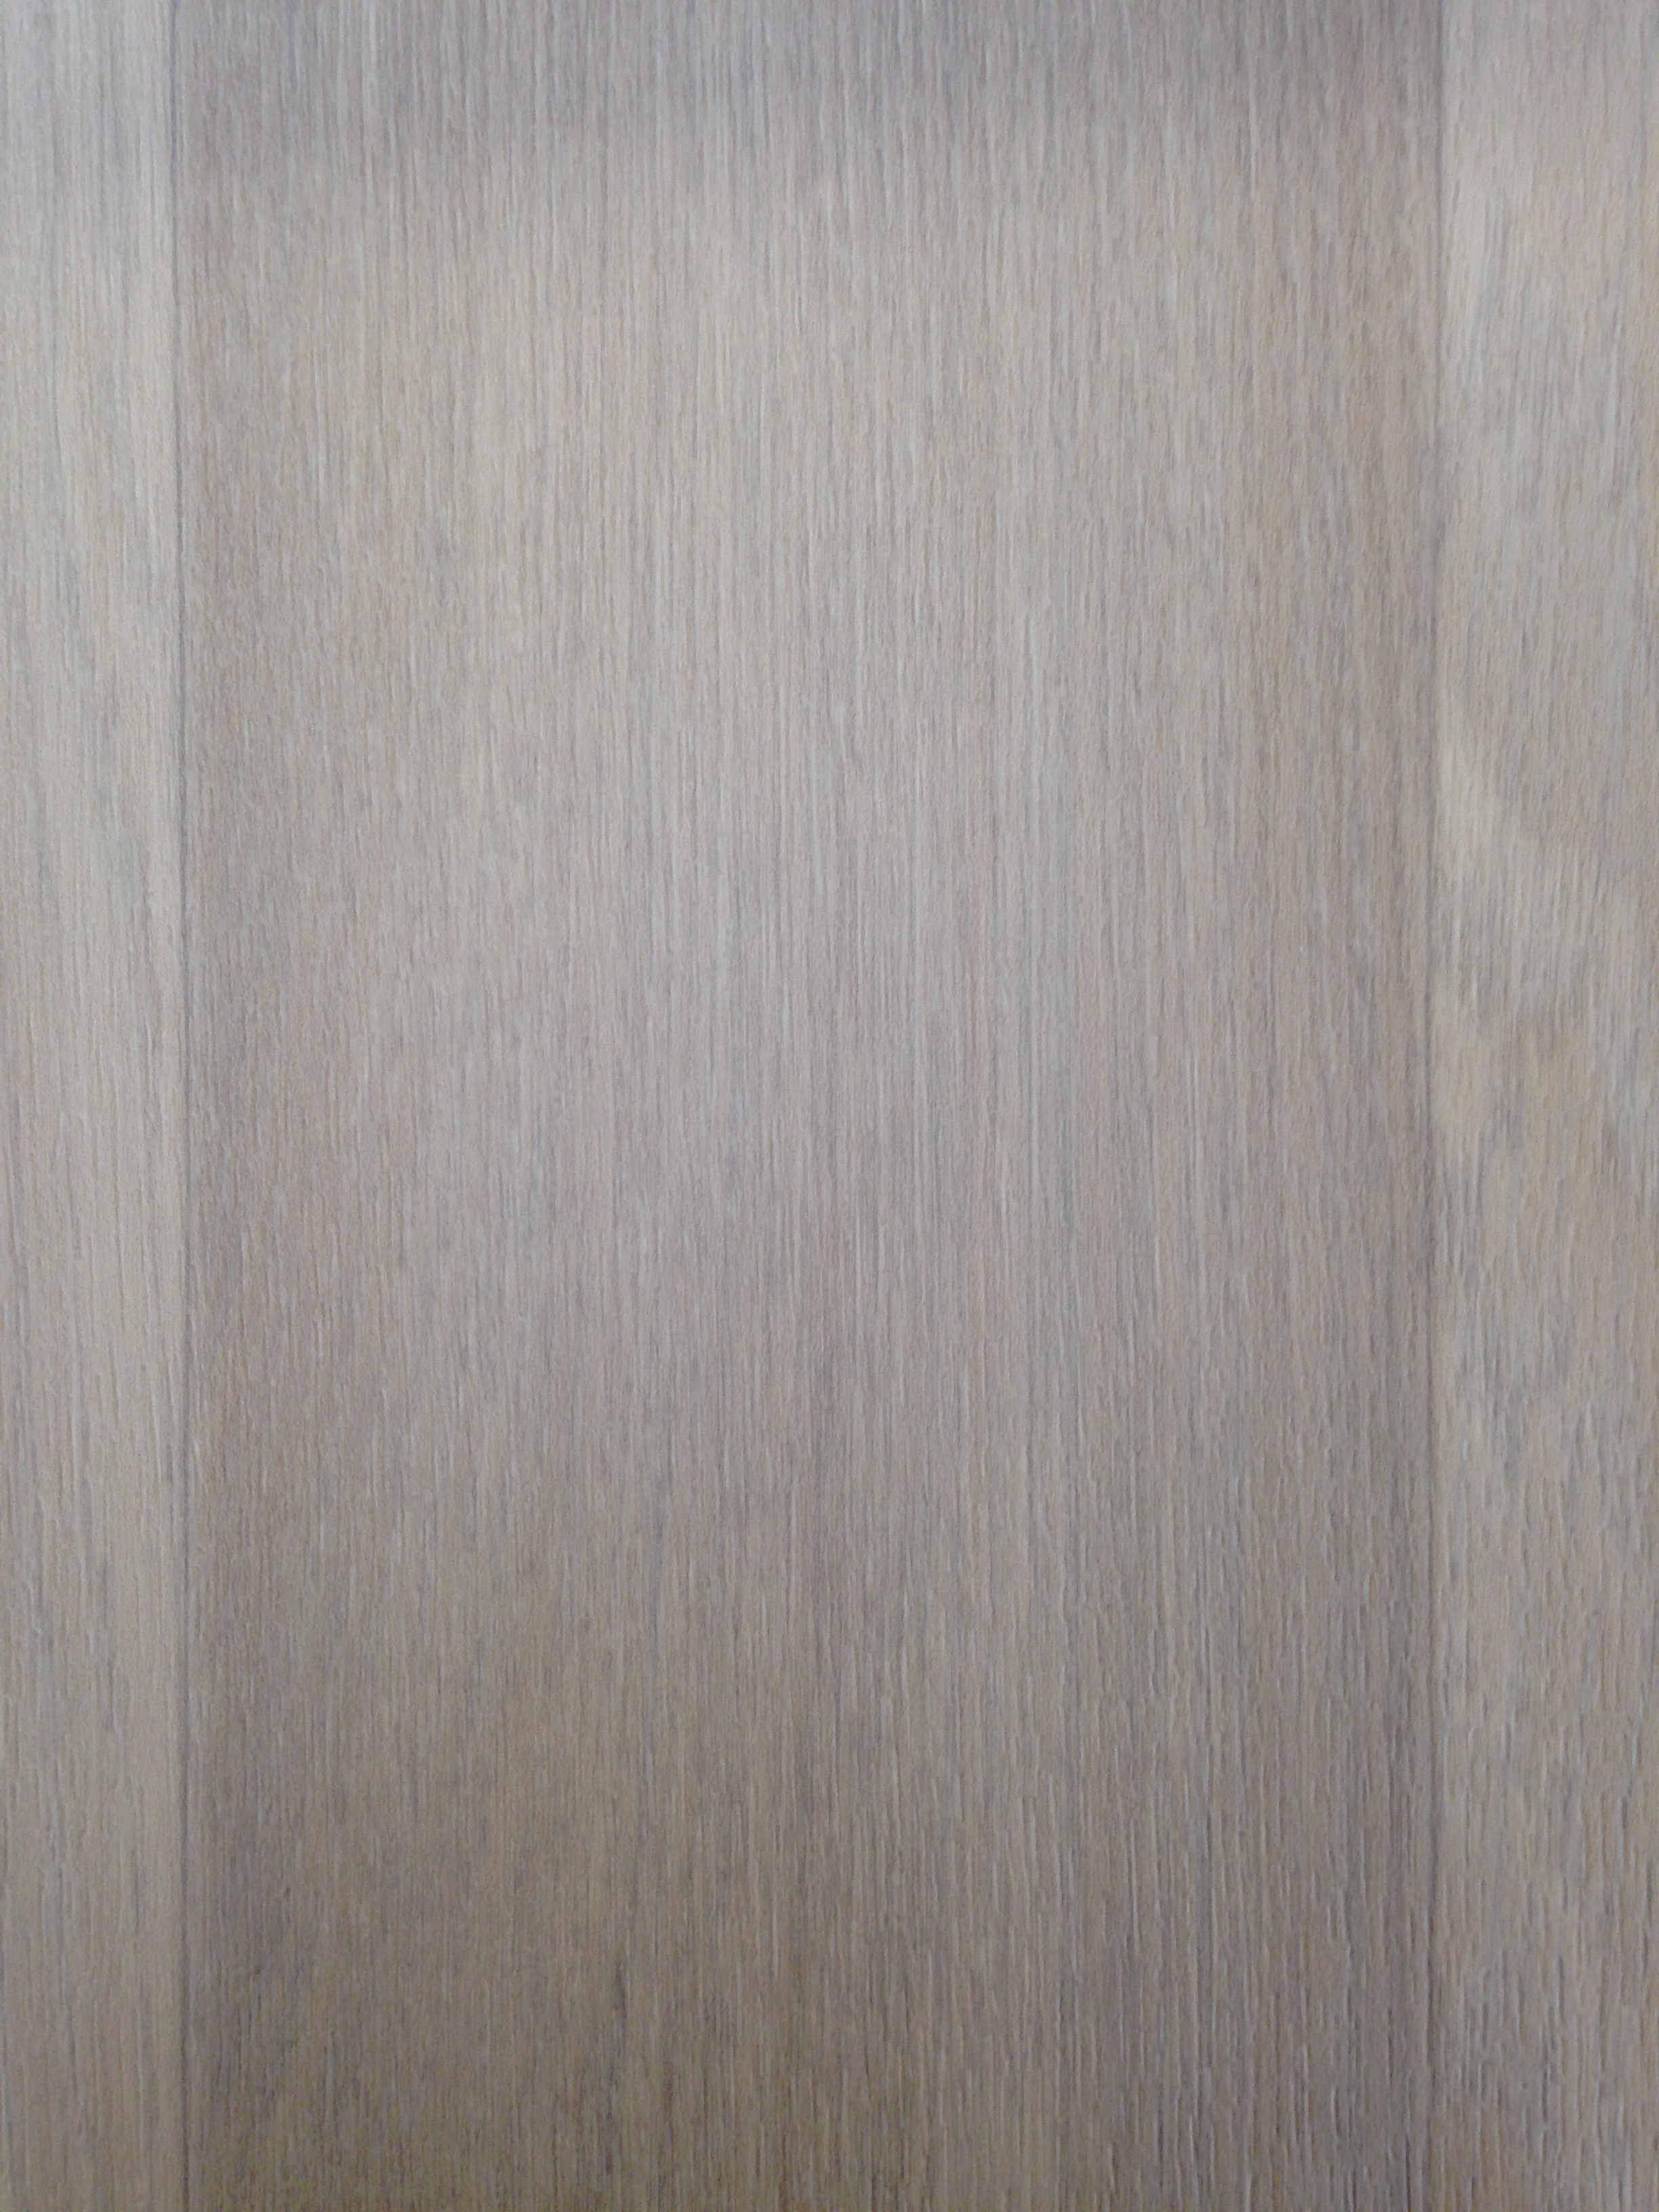 Liquorice - Splinter